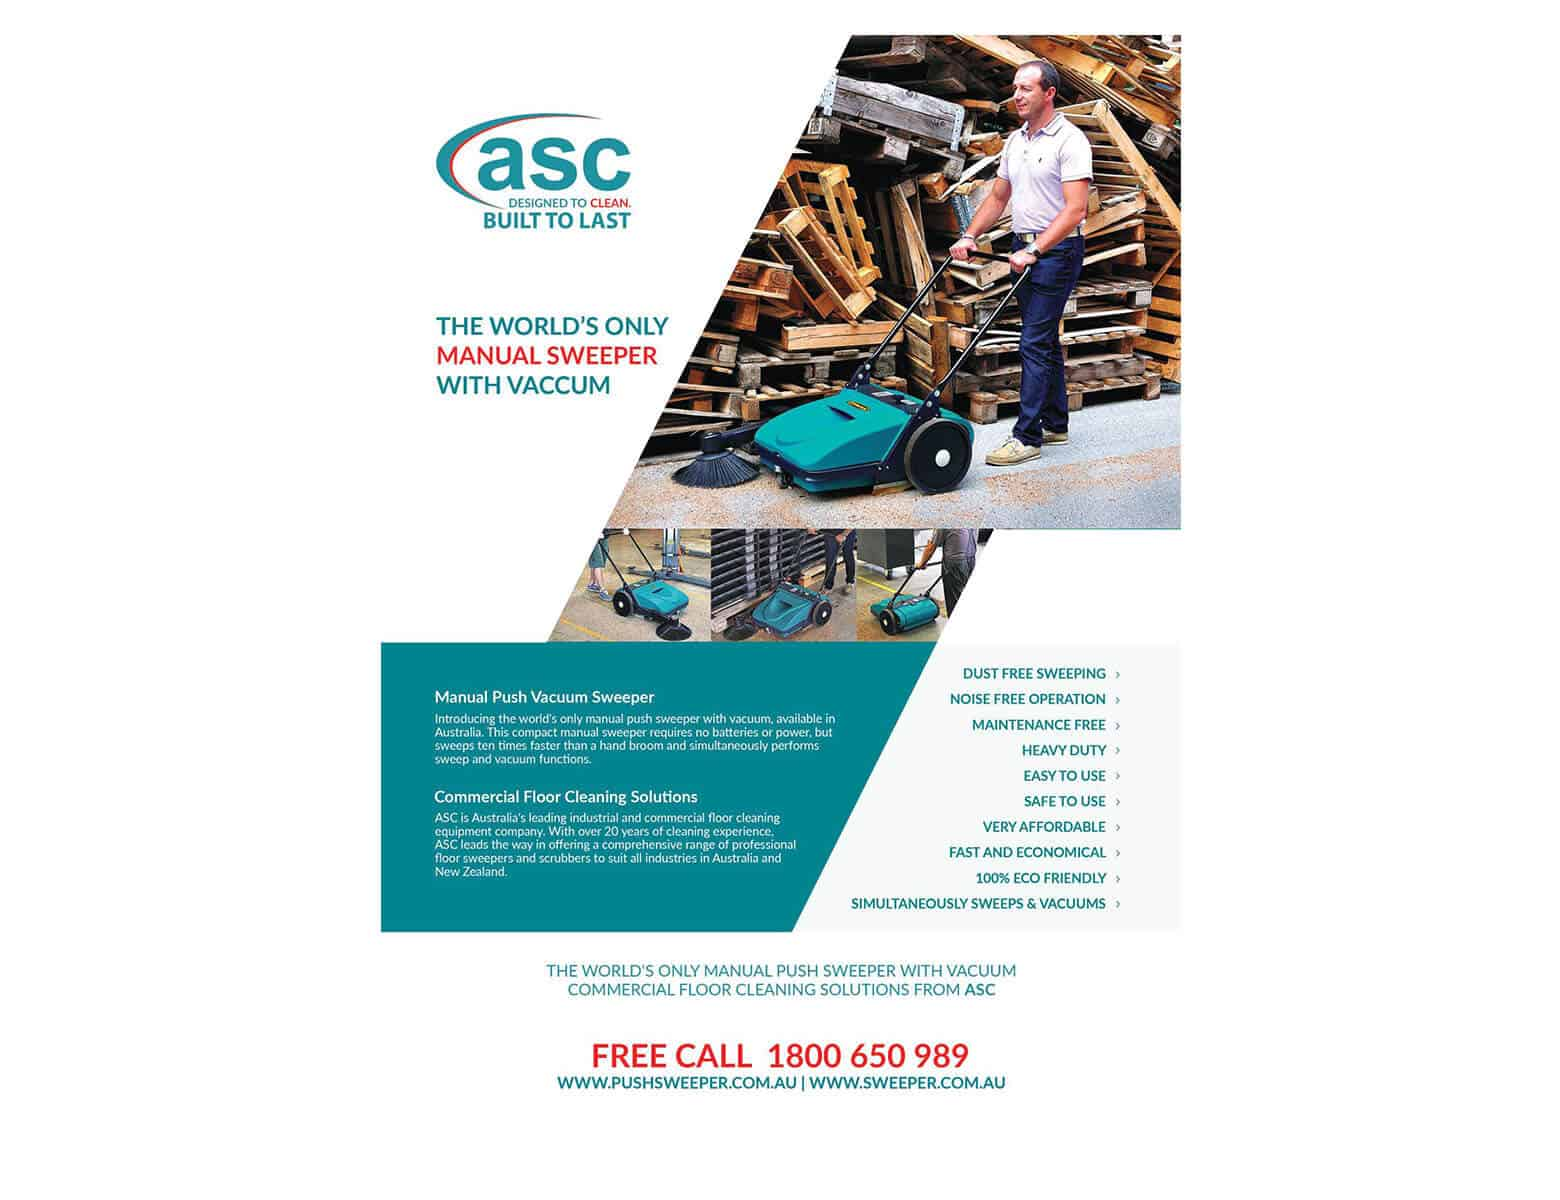 ASC-Pushsweeper-Brochure